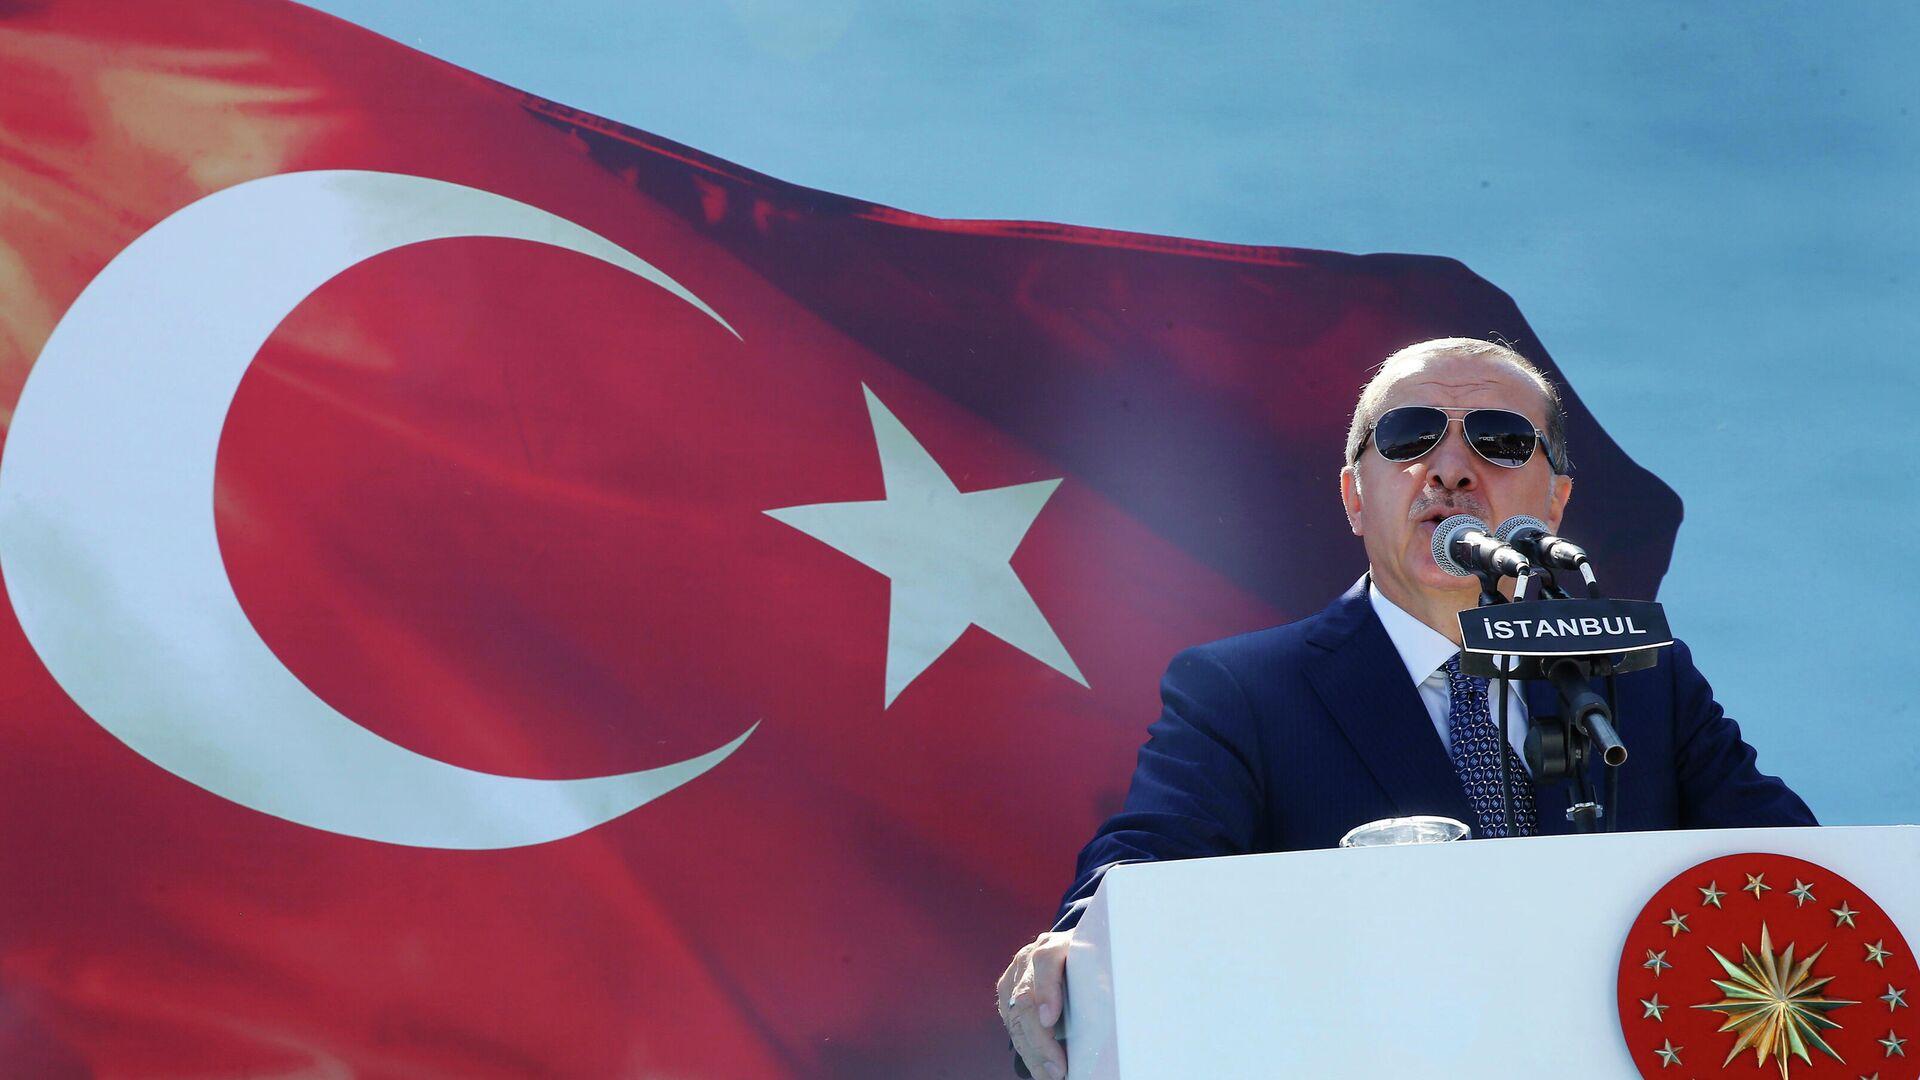 Президент Турции Реджеп Тайип Эрдоган - РИА Новости, 1920, 20.10.2020